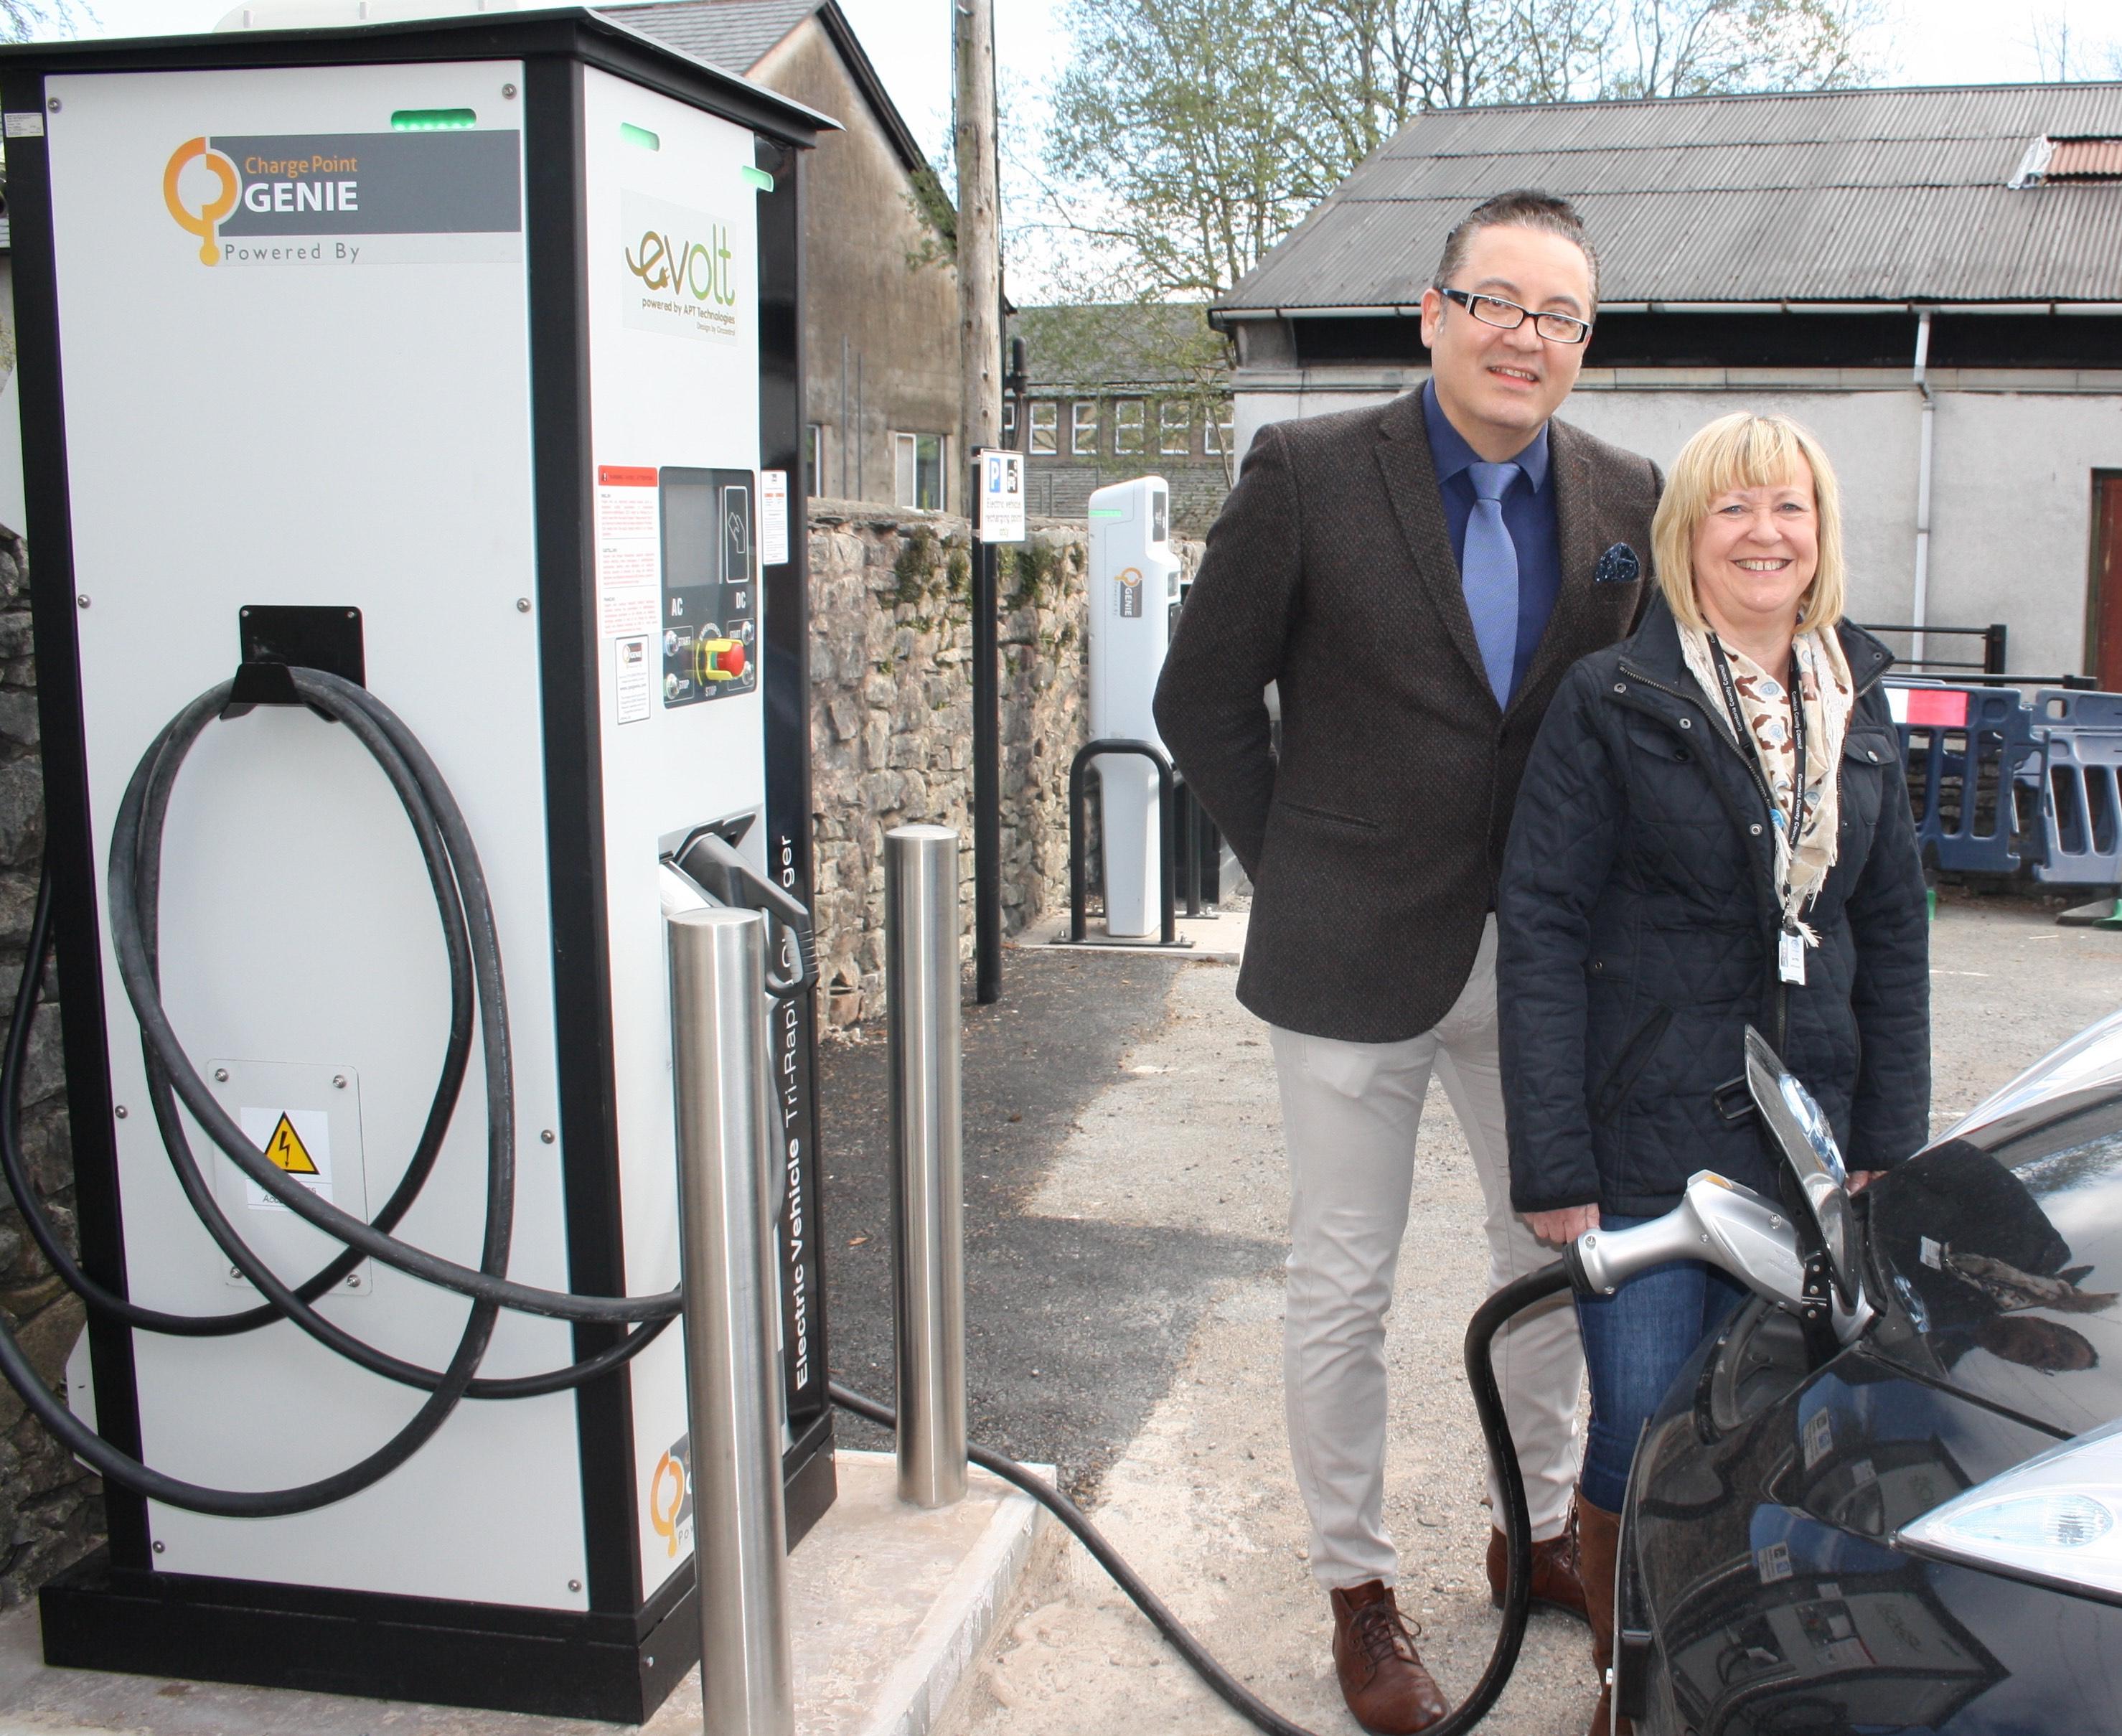 eVolt charging points in Cumbria